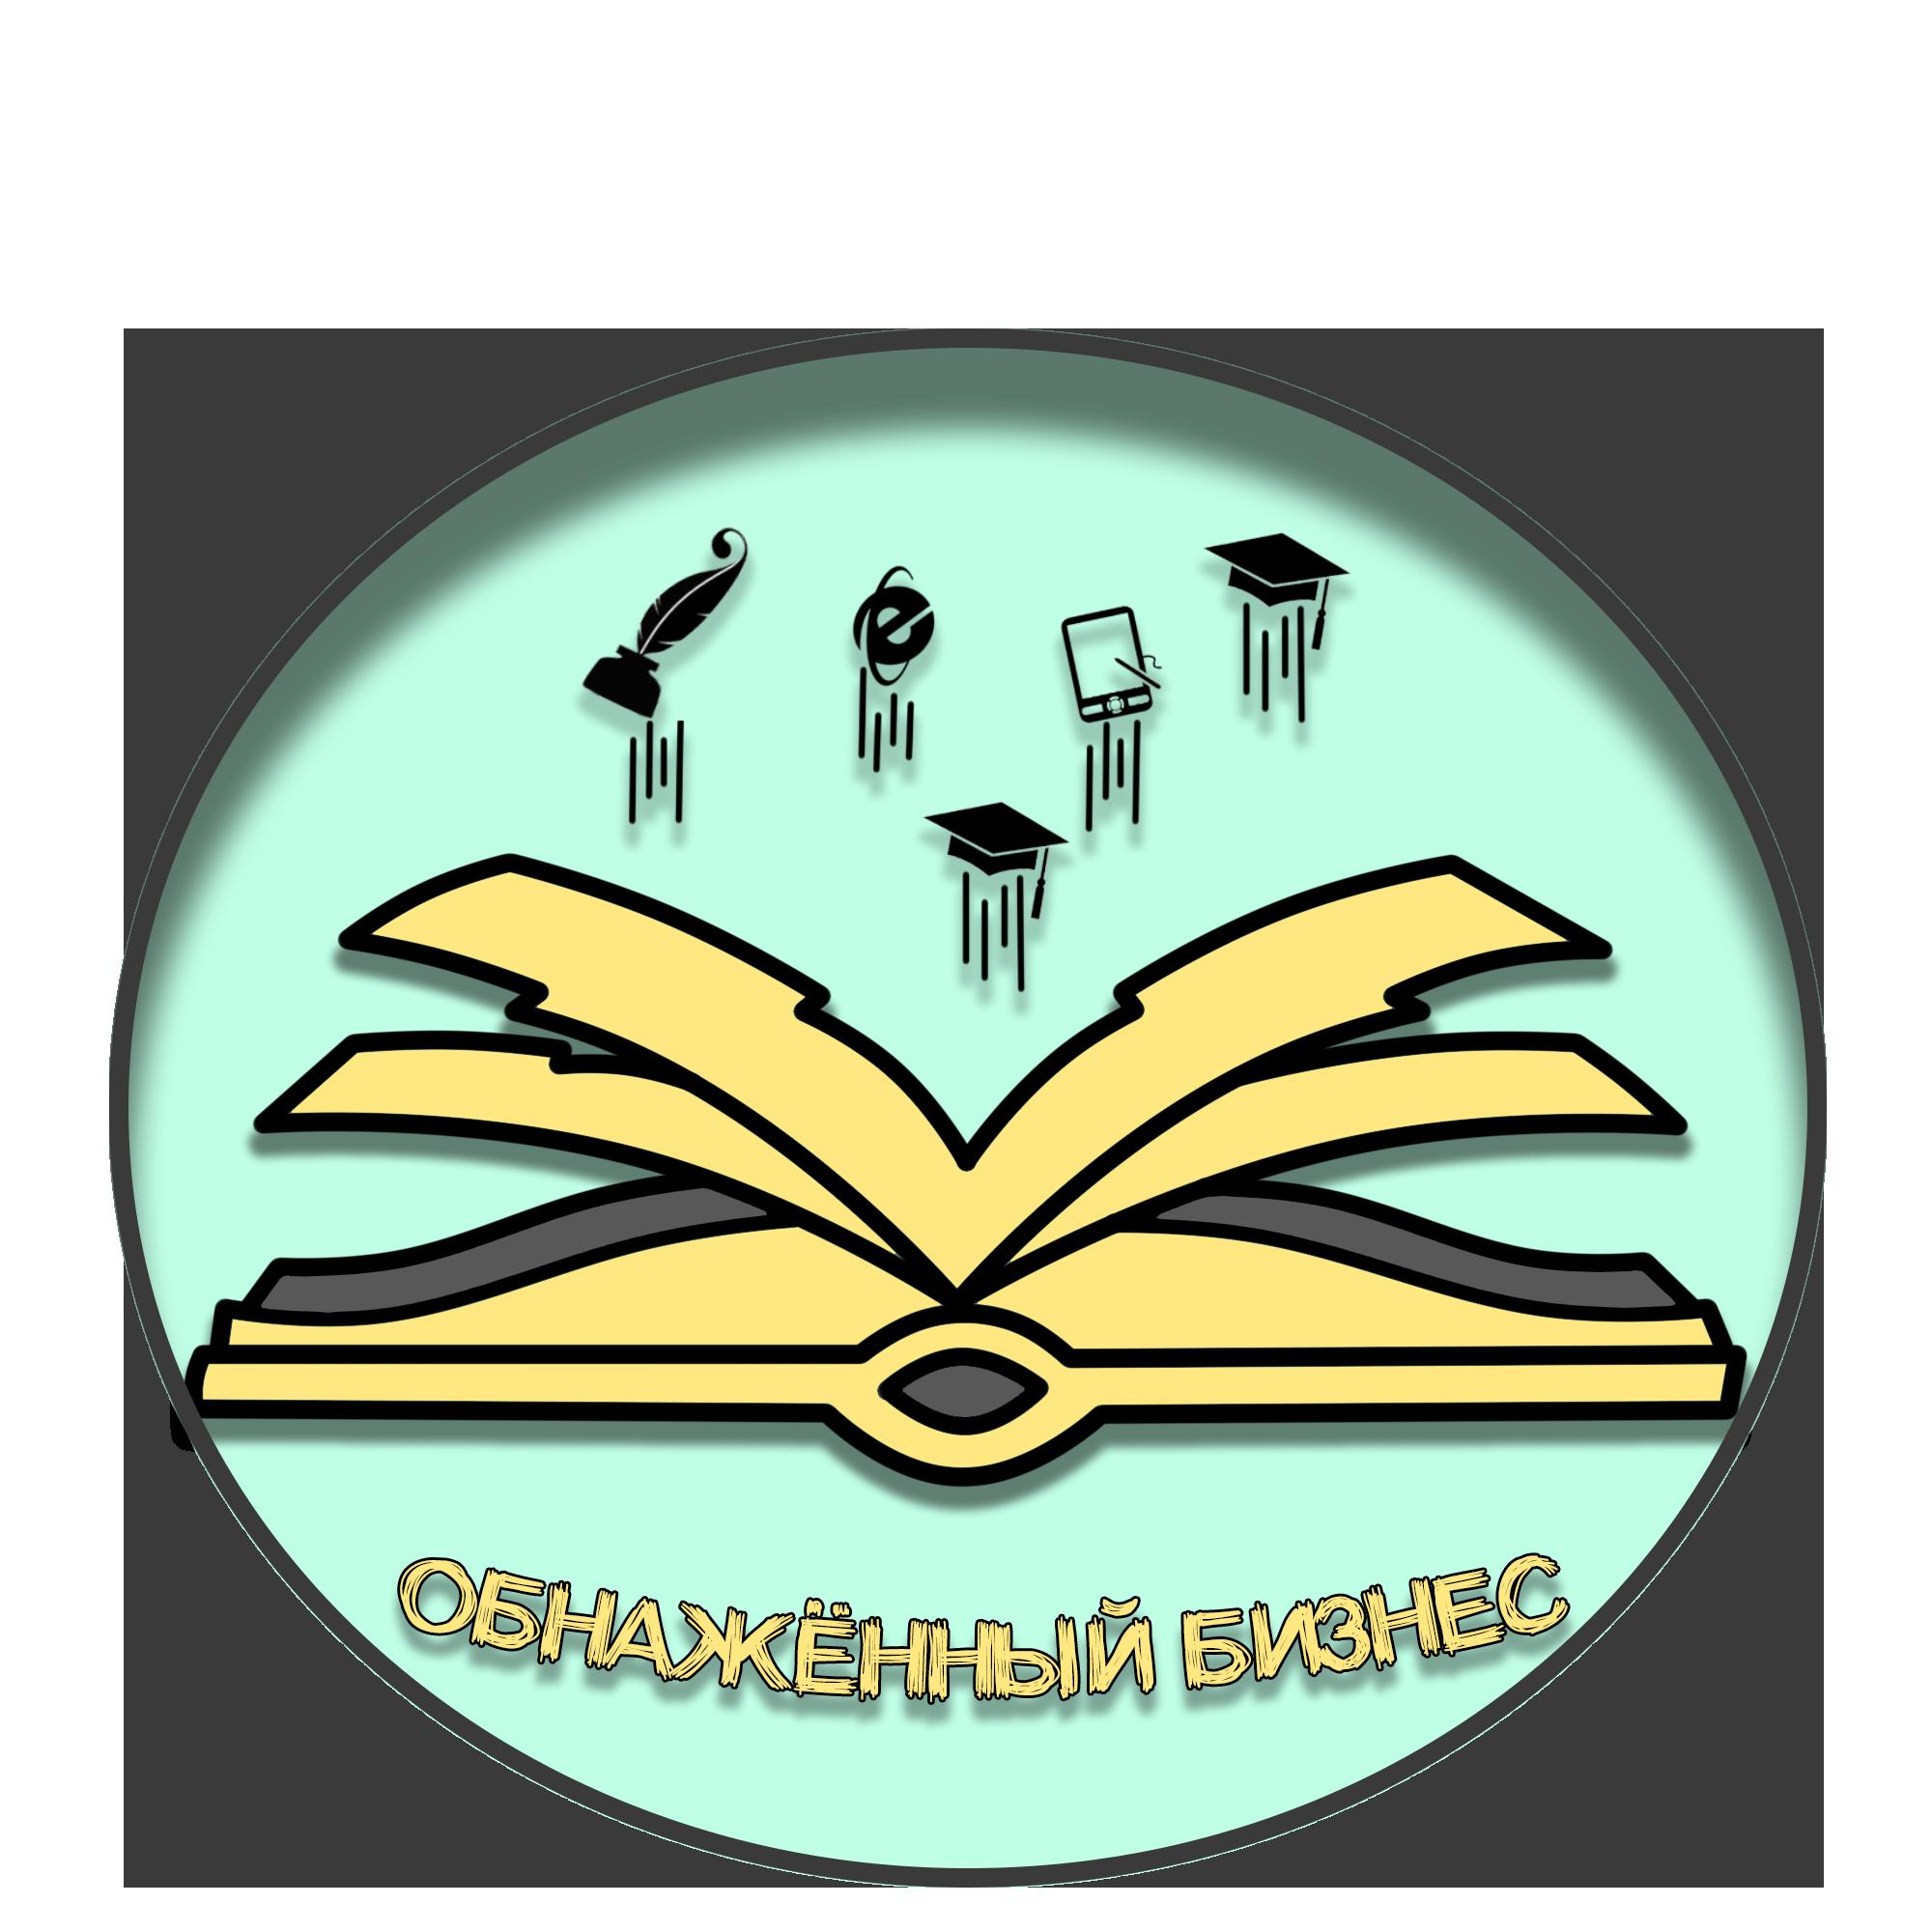 "Логотип для продюсерского центра ""Обнажённый бизнес"" фото f_6935b9bca8f1bbe0.png"